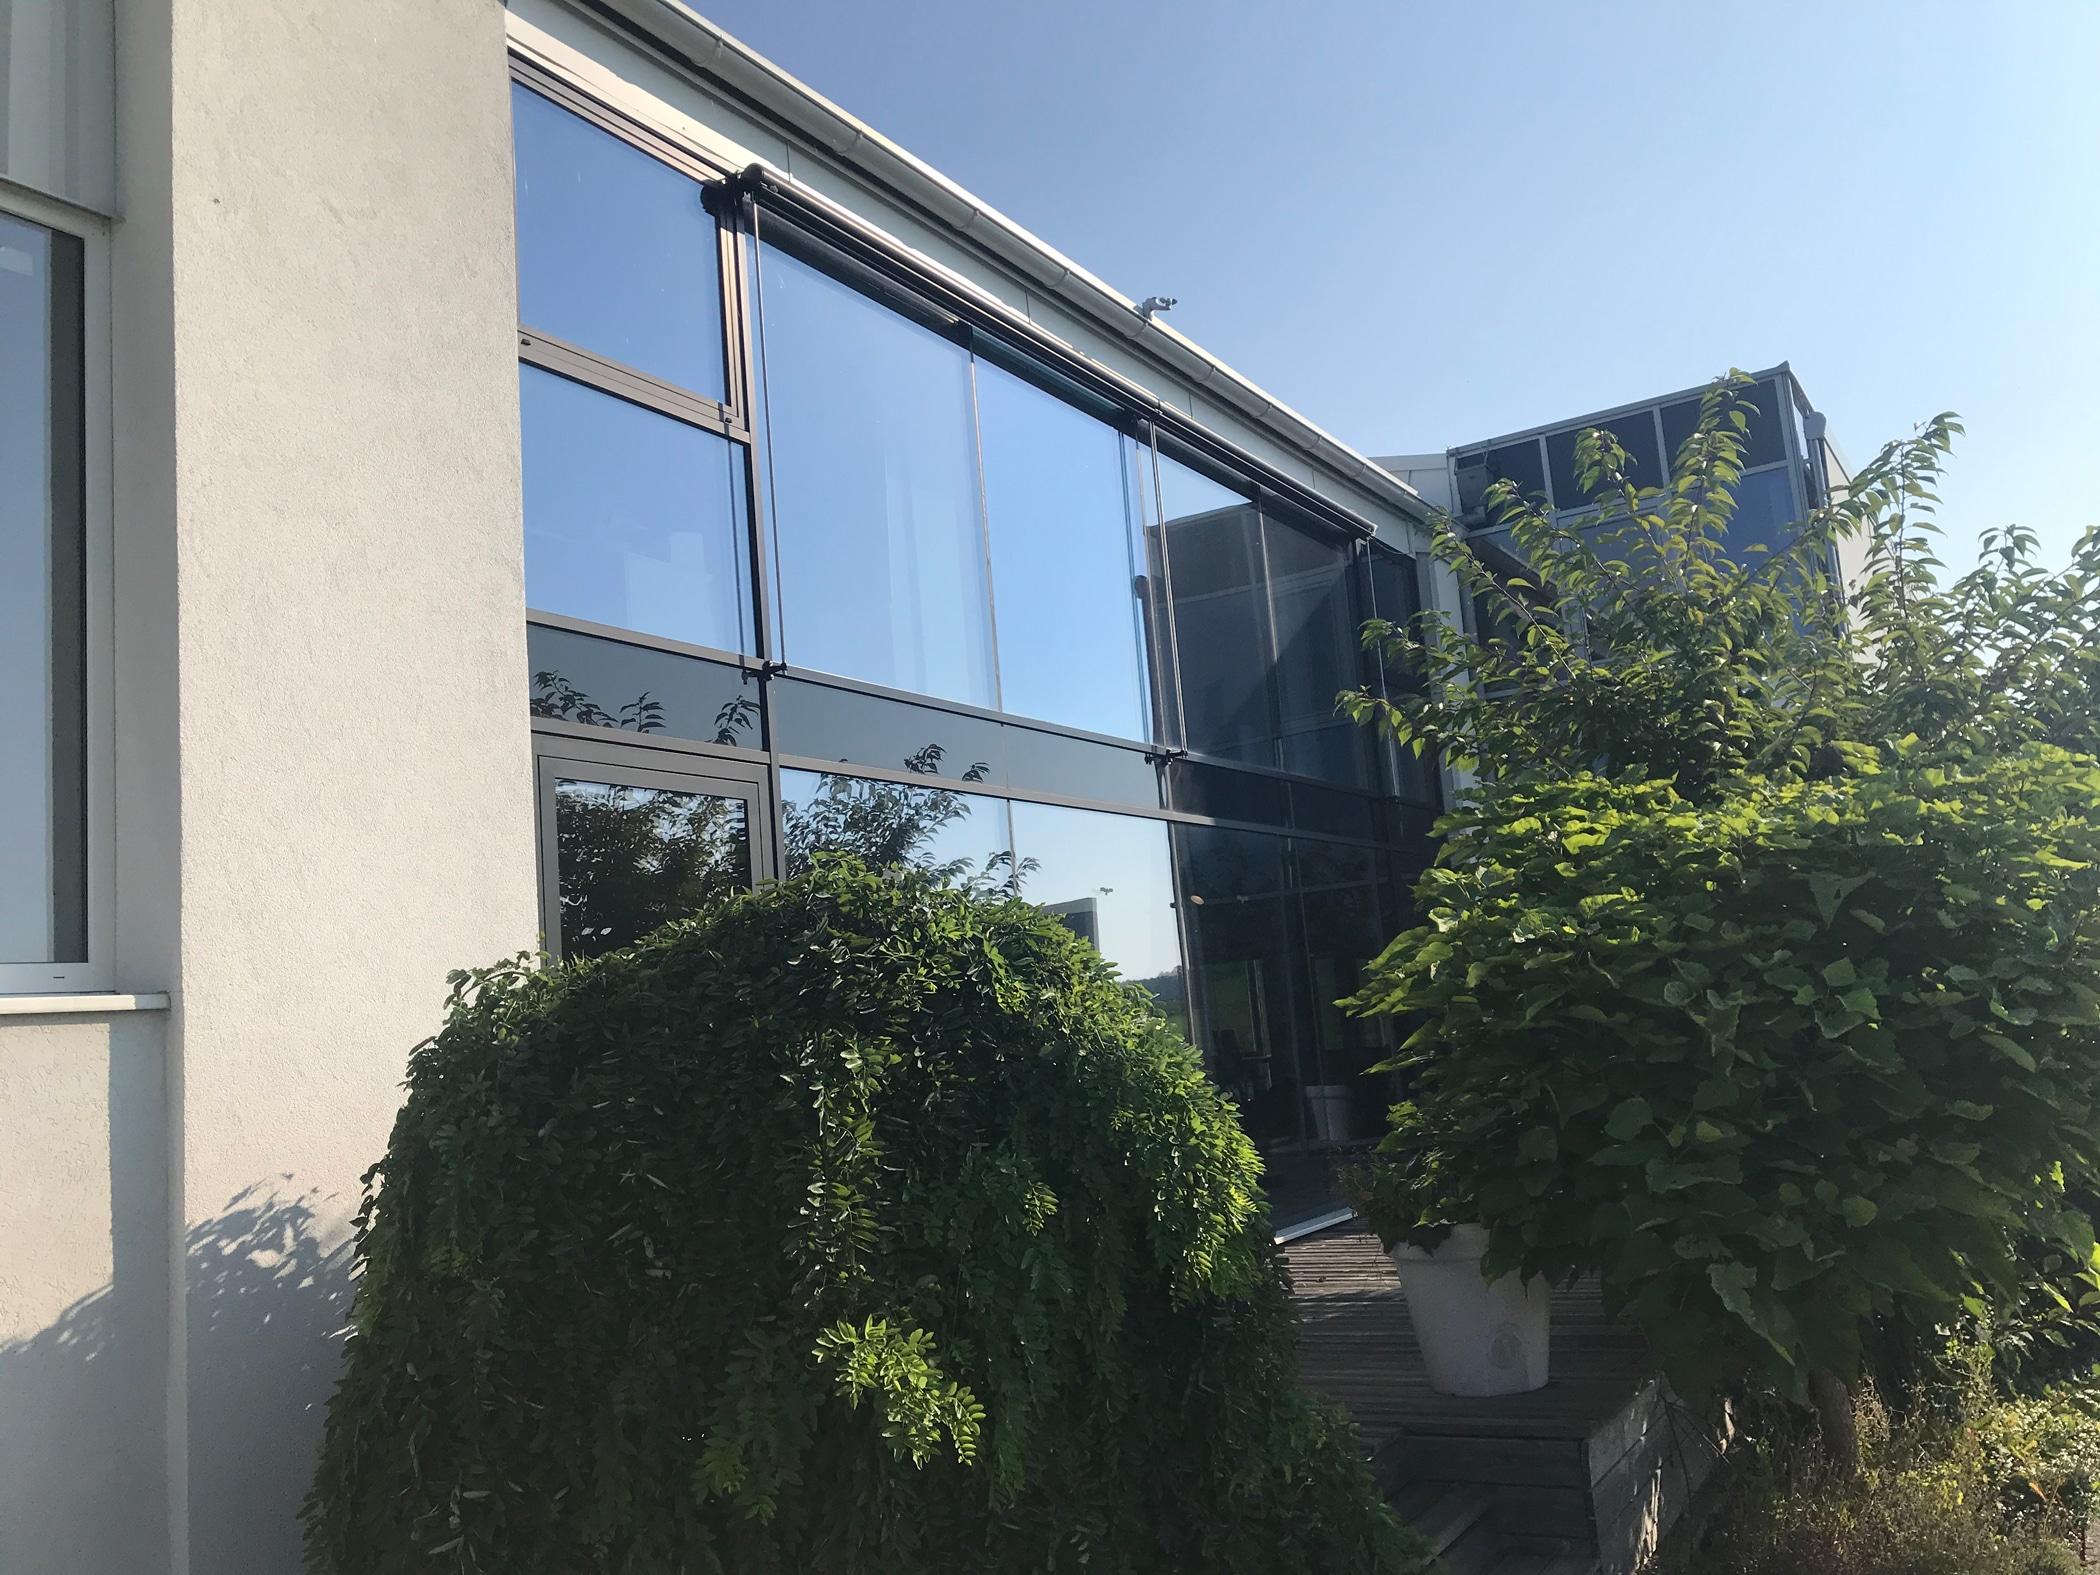 Aluminium-Glasfassade Nurglas - Aluprofile in schwarz